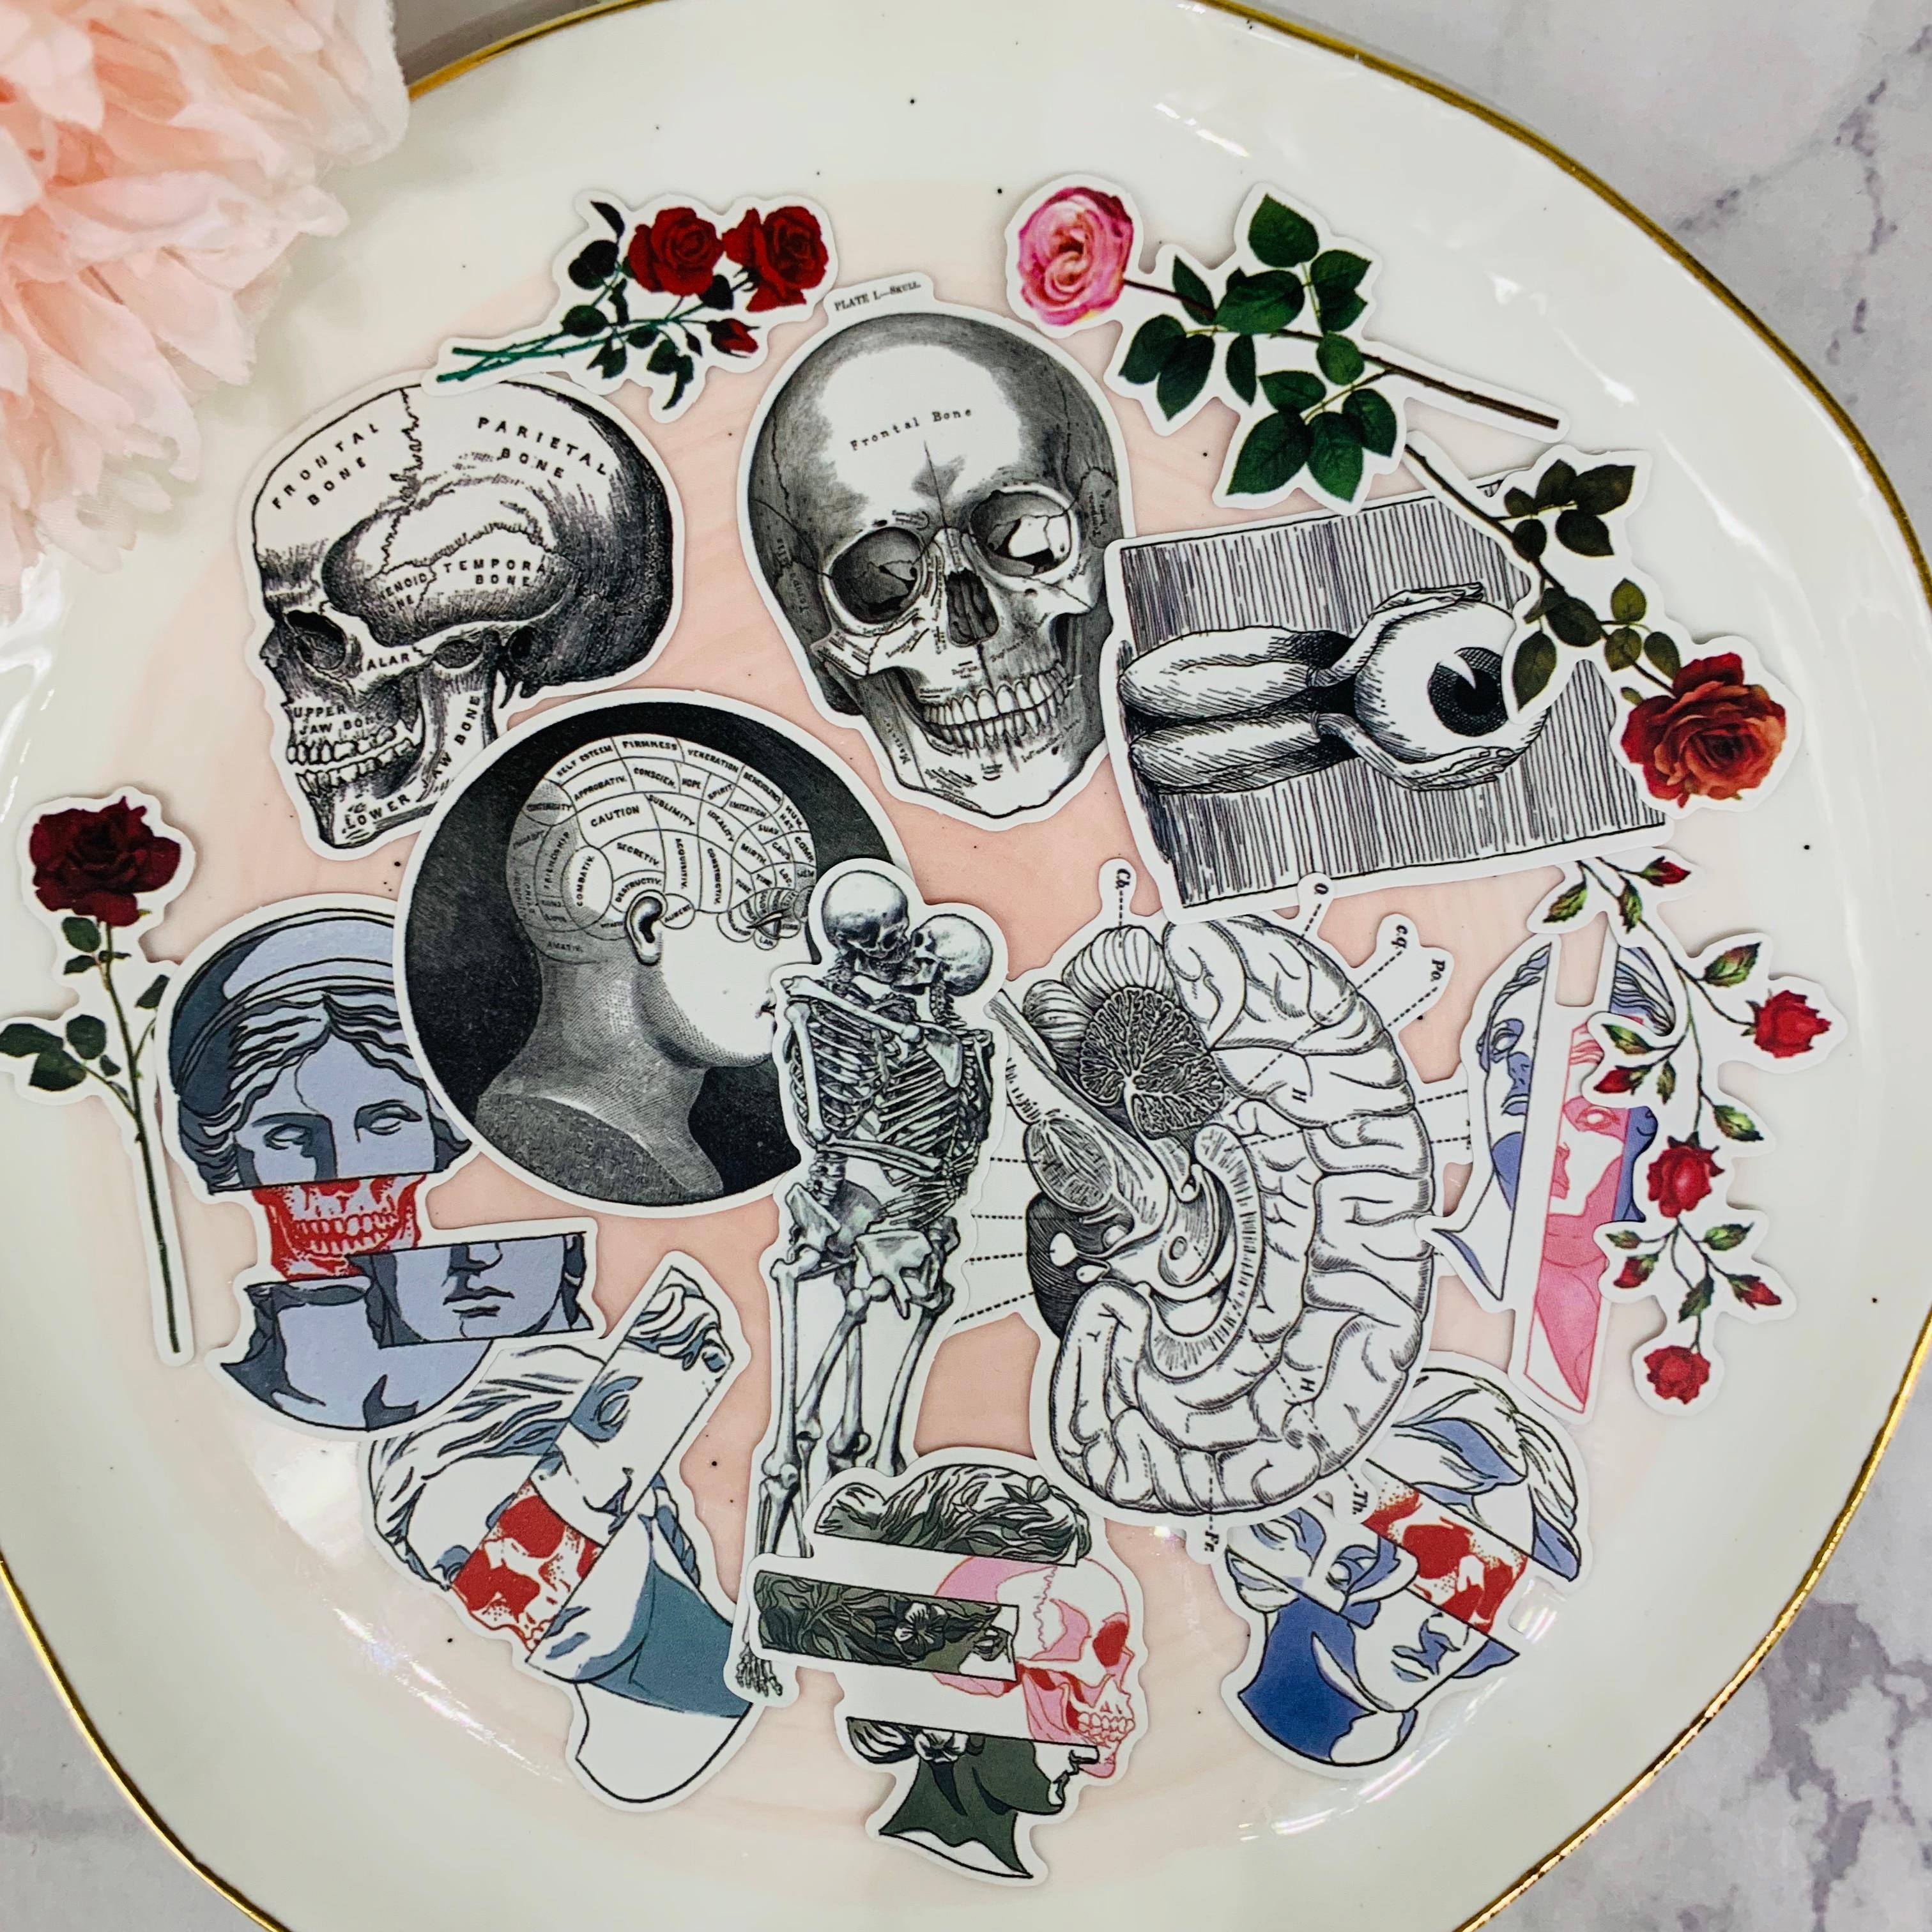 16Pcs/Pack Vintage Death Skull Skeleton Sticker DIY Scrapbooking Album Junk Journal Planner Decorative Stickers